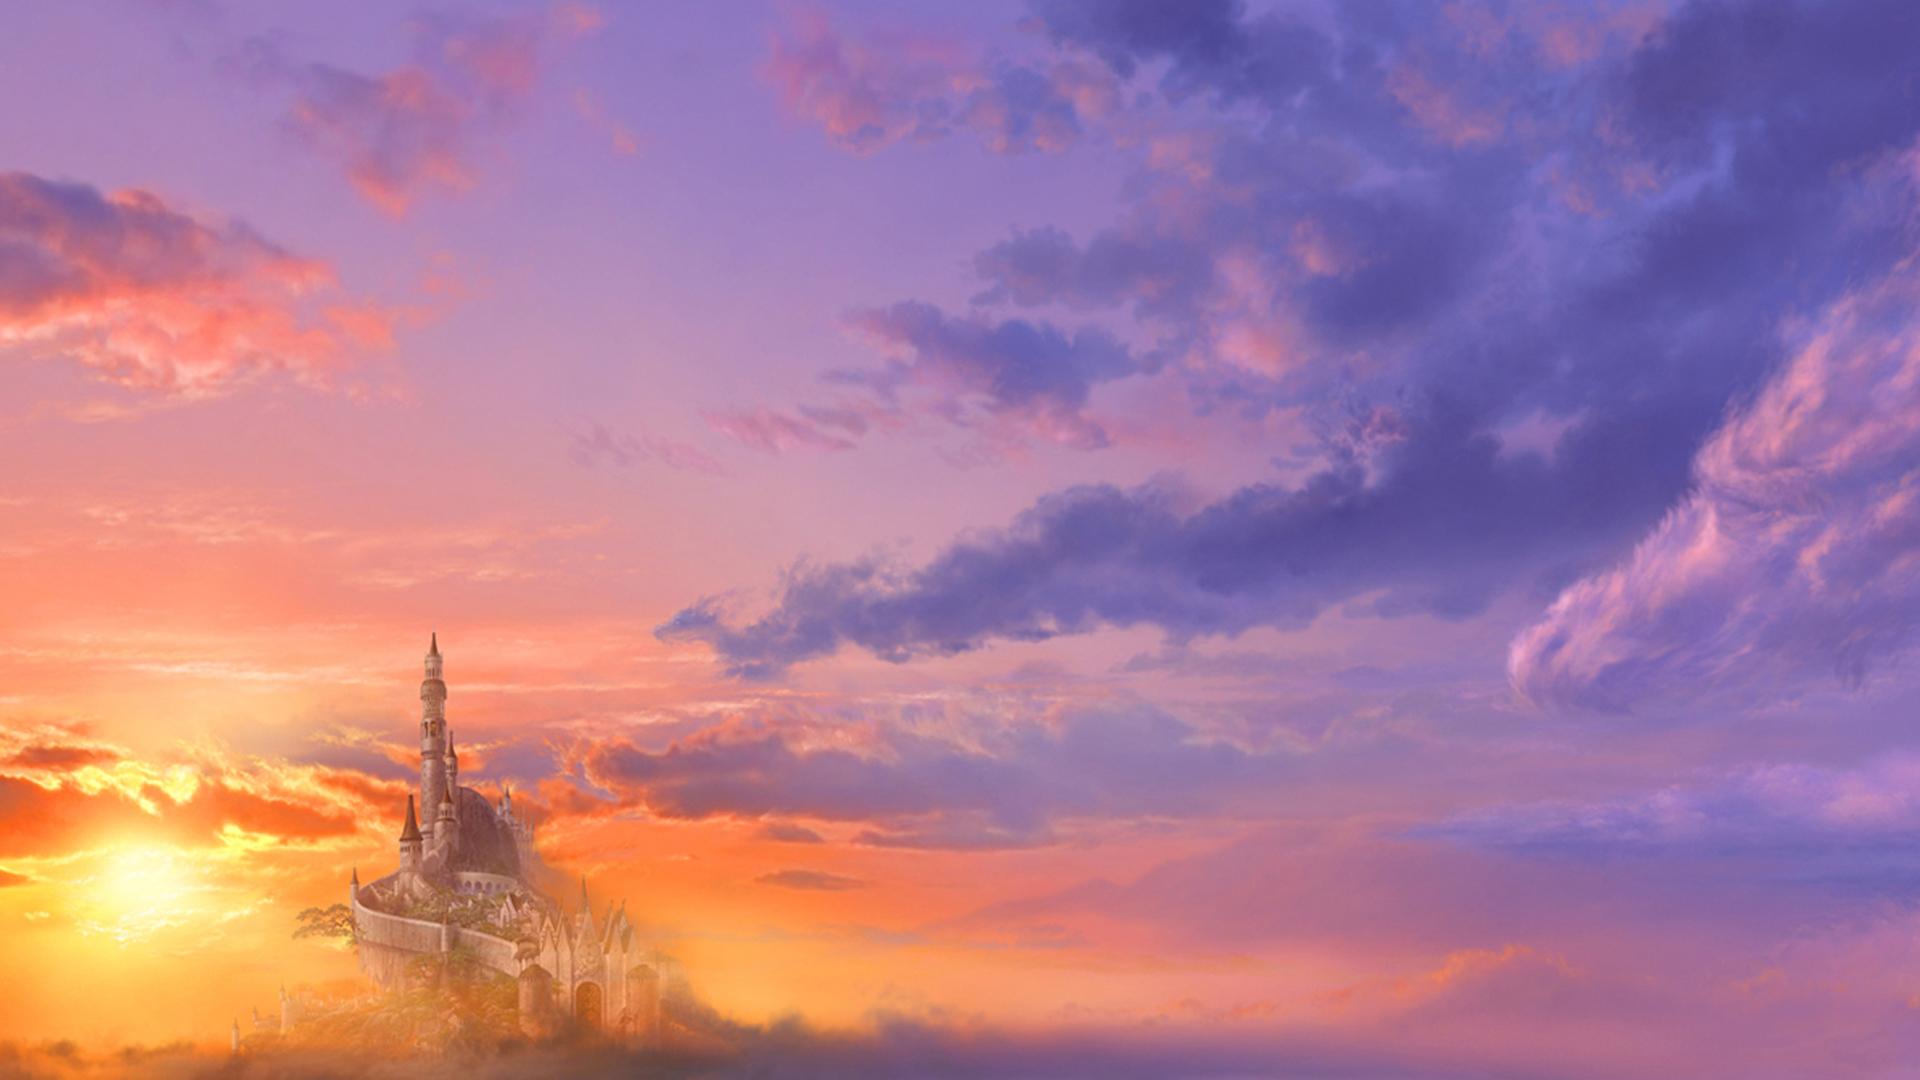 Free Download Castle In The Sky Wallpaper Forwallpapercom